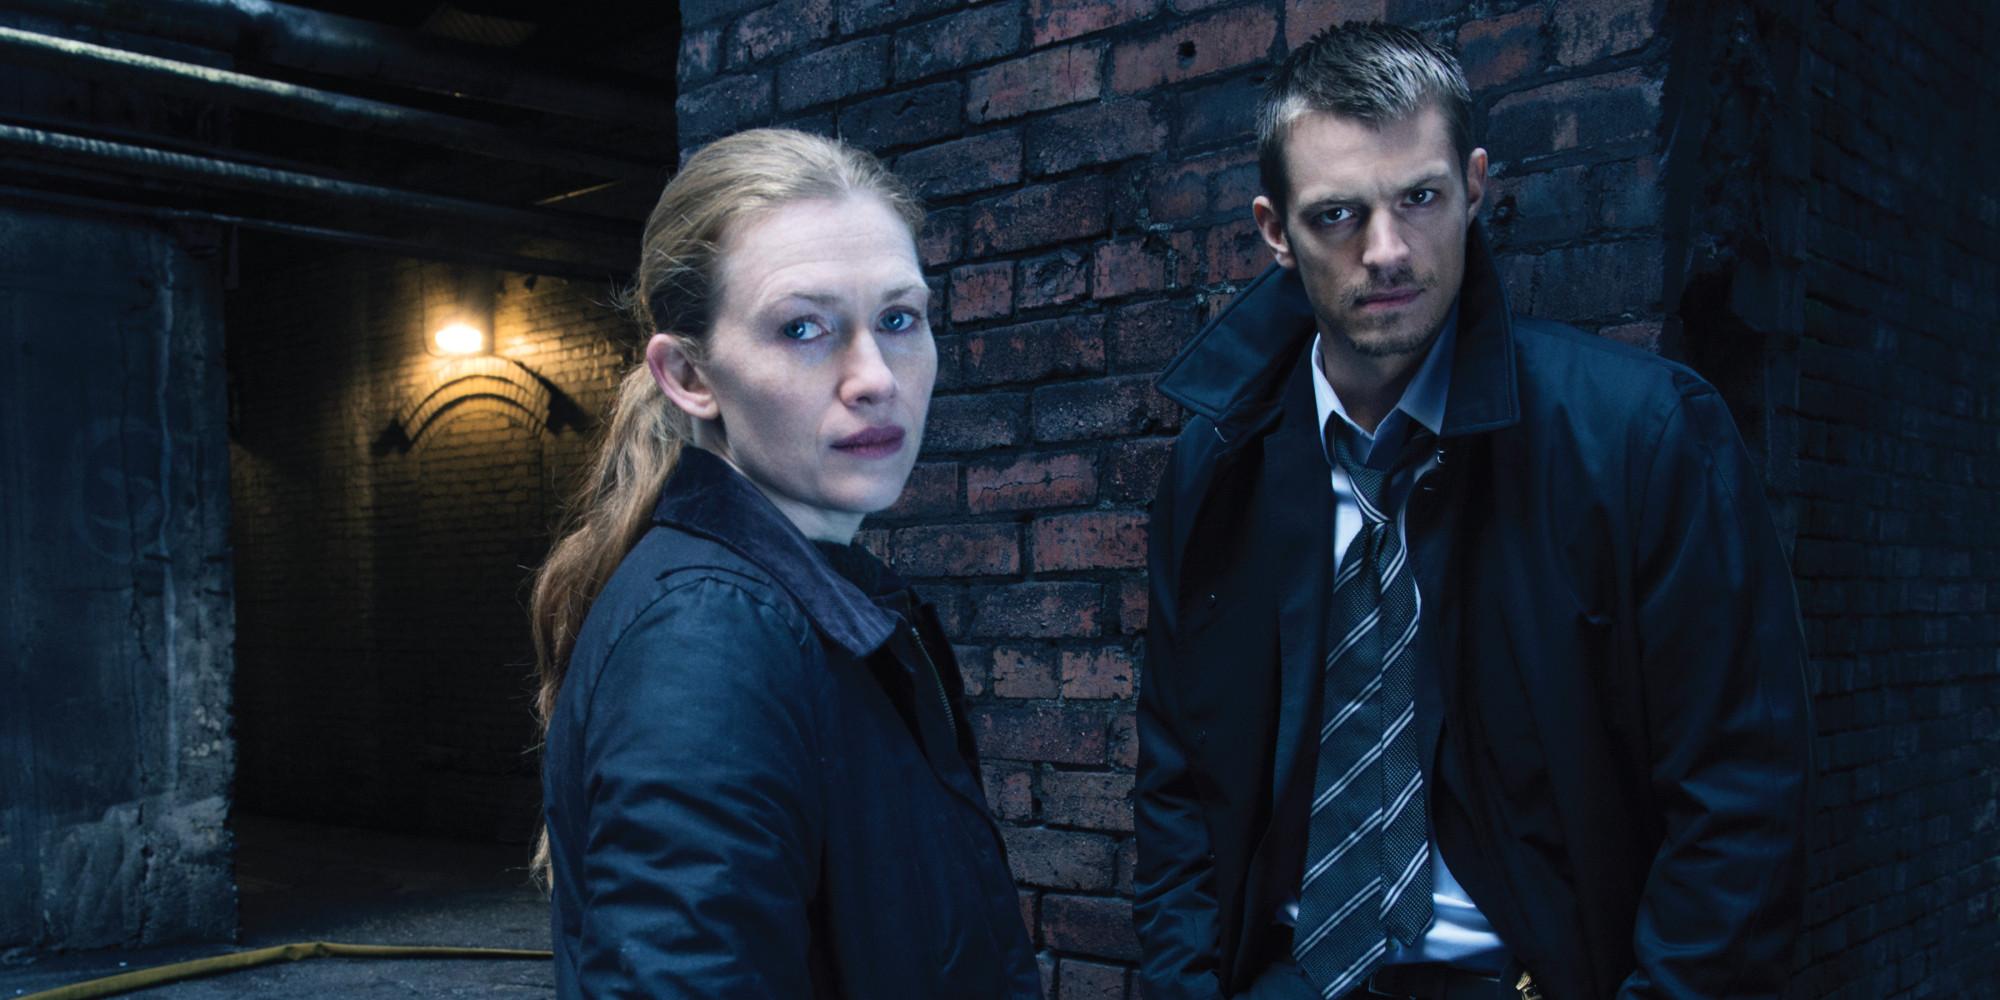 Sarah Linden (Mireille Enos) and Stephen Holder (Joel Kinnaman)  in The Killing